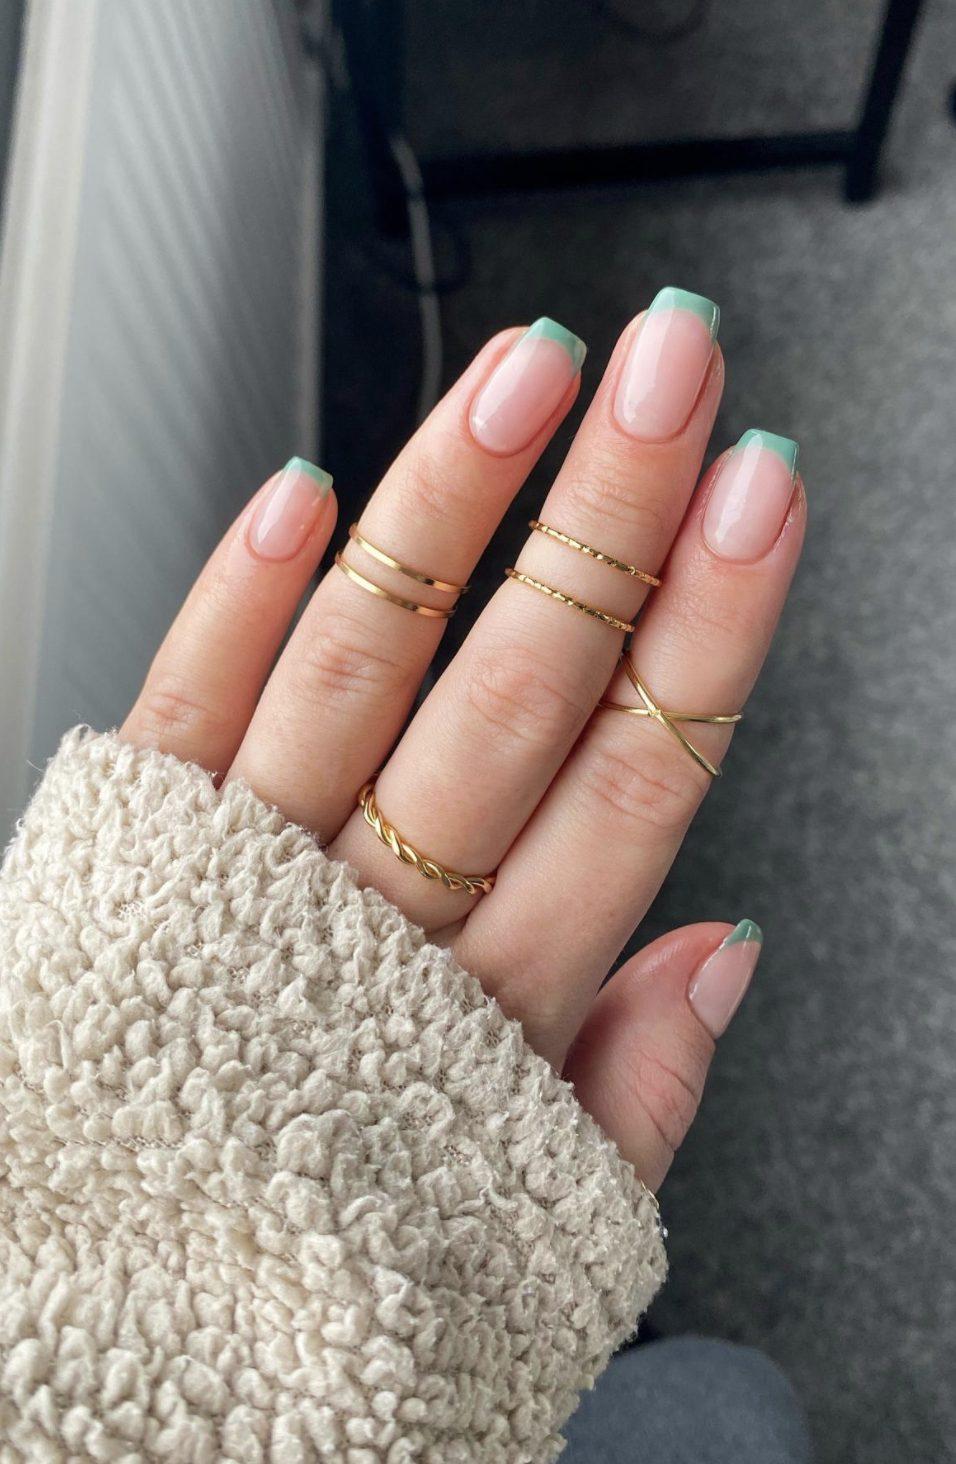 Short sage green French tip nails